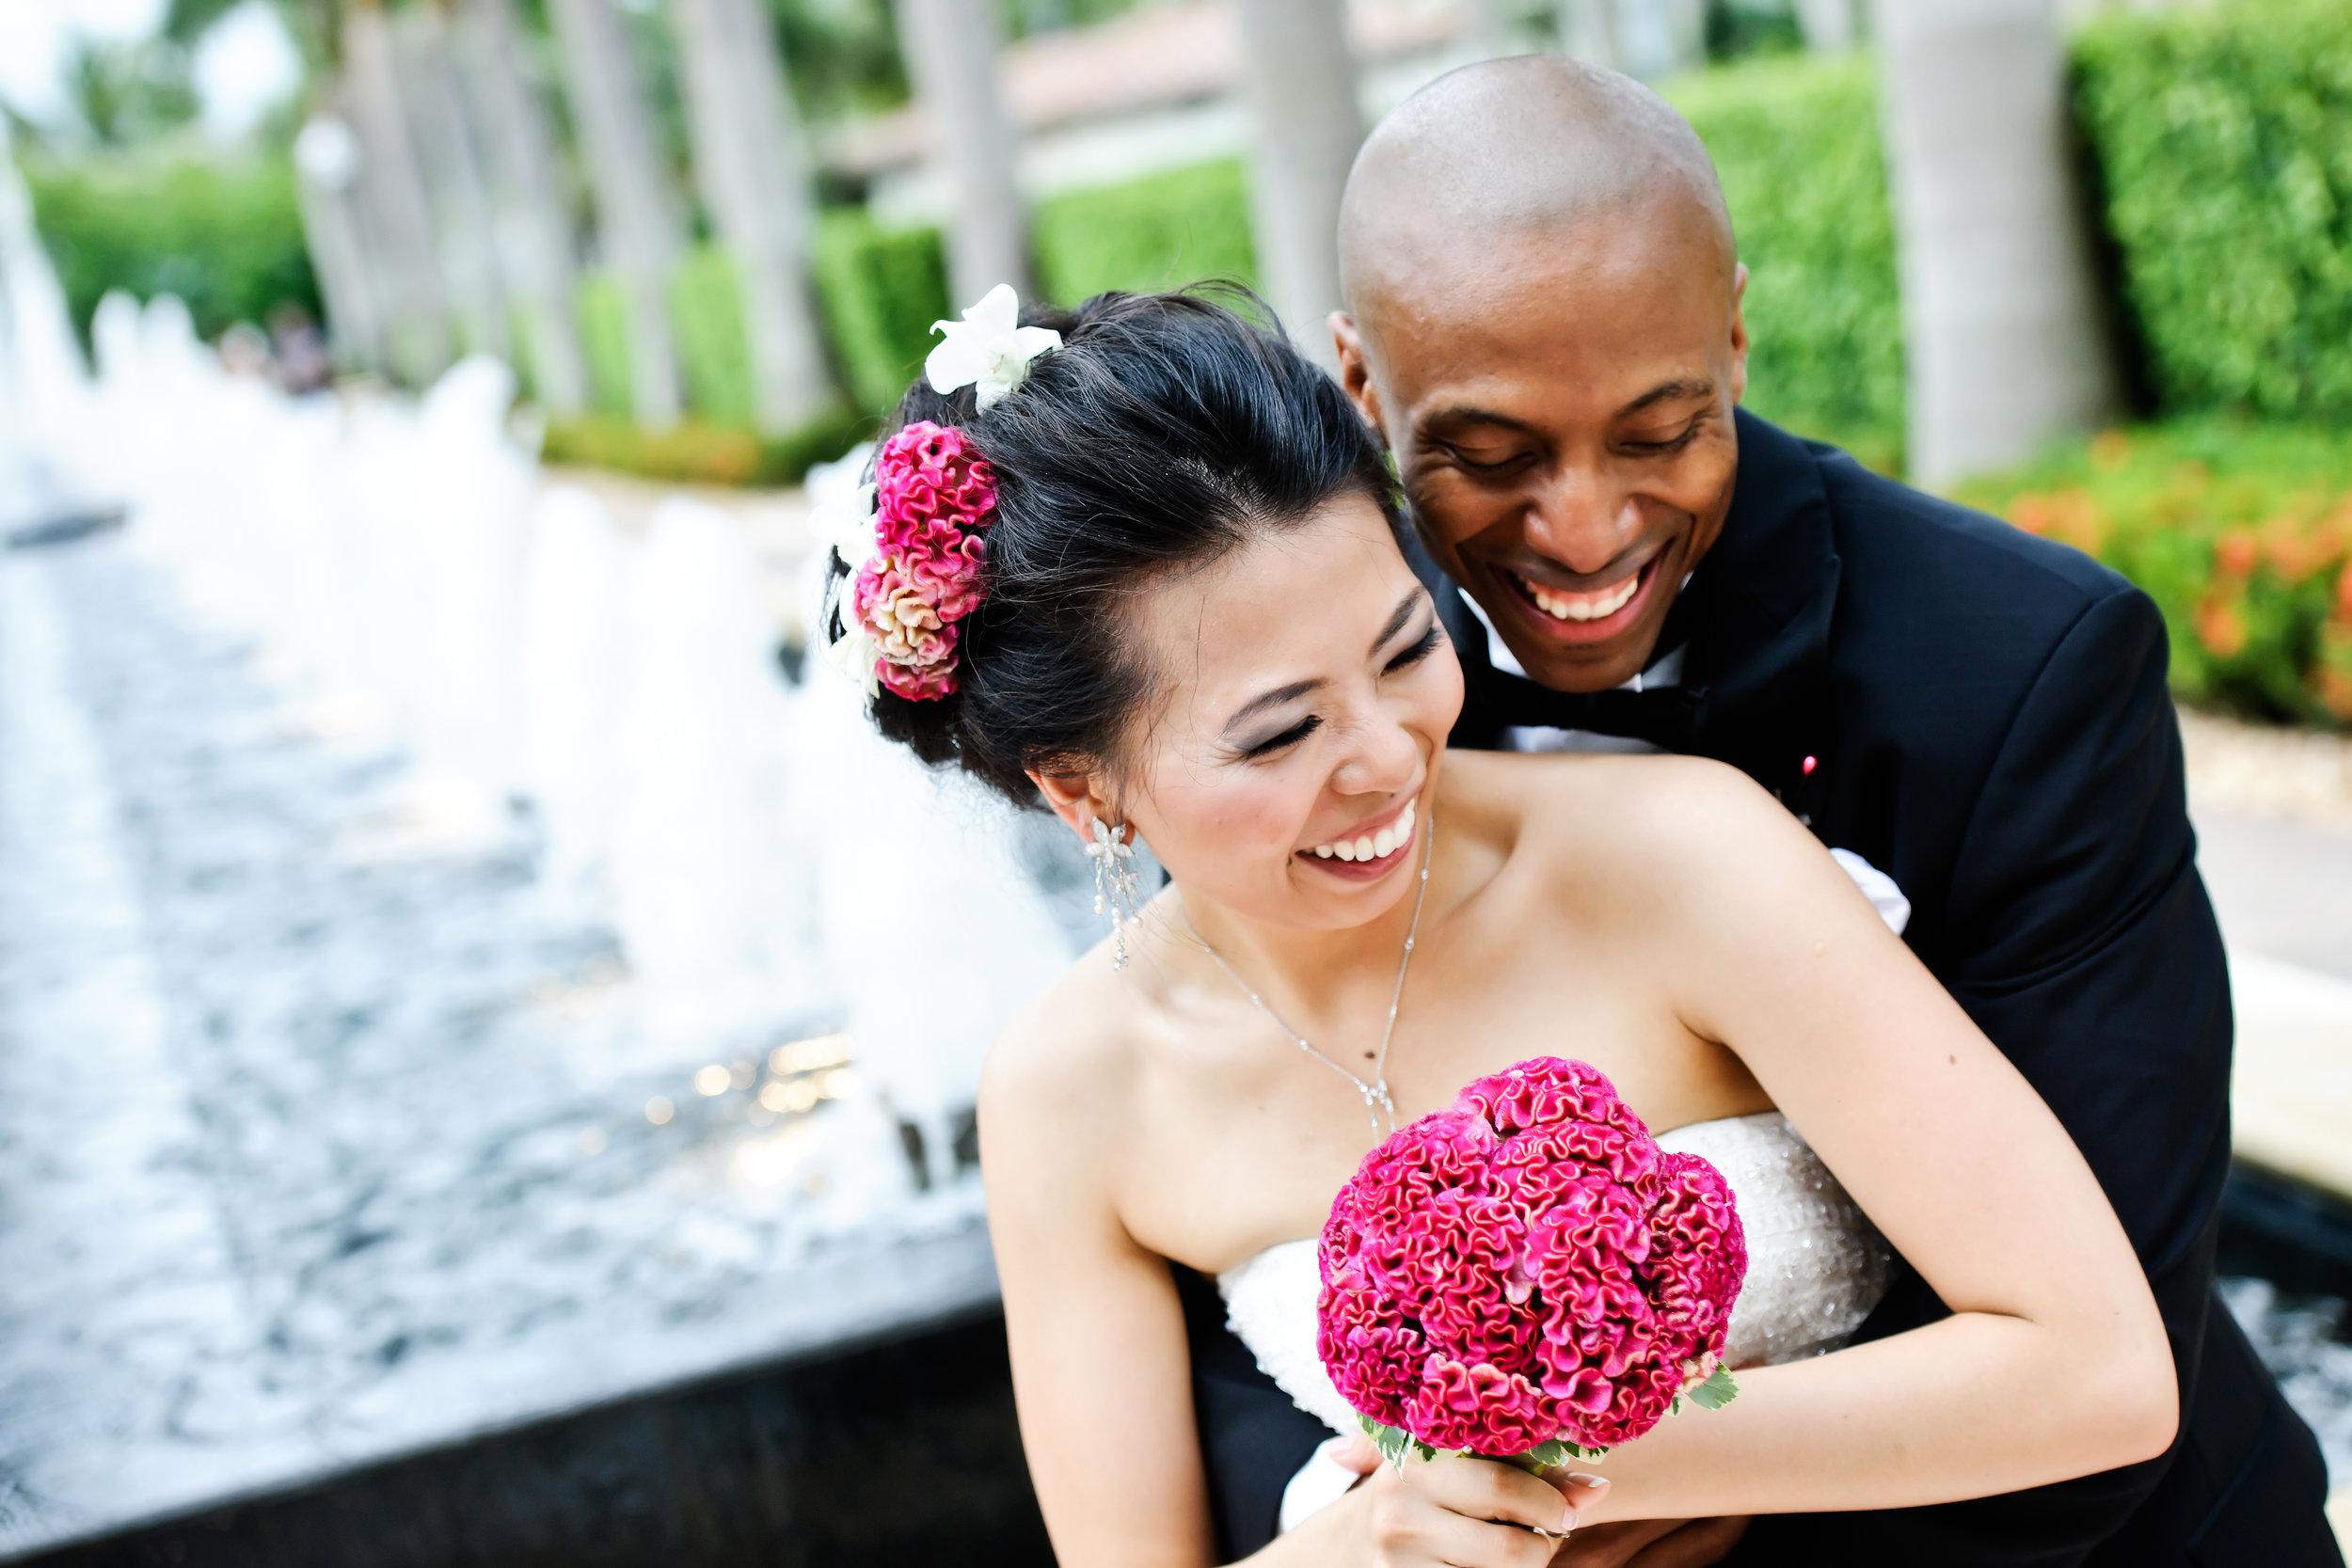 Bridal Bouquet Hot Pink Celosia.jpg